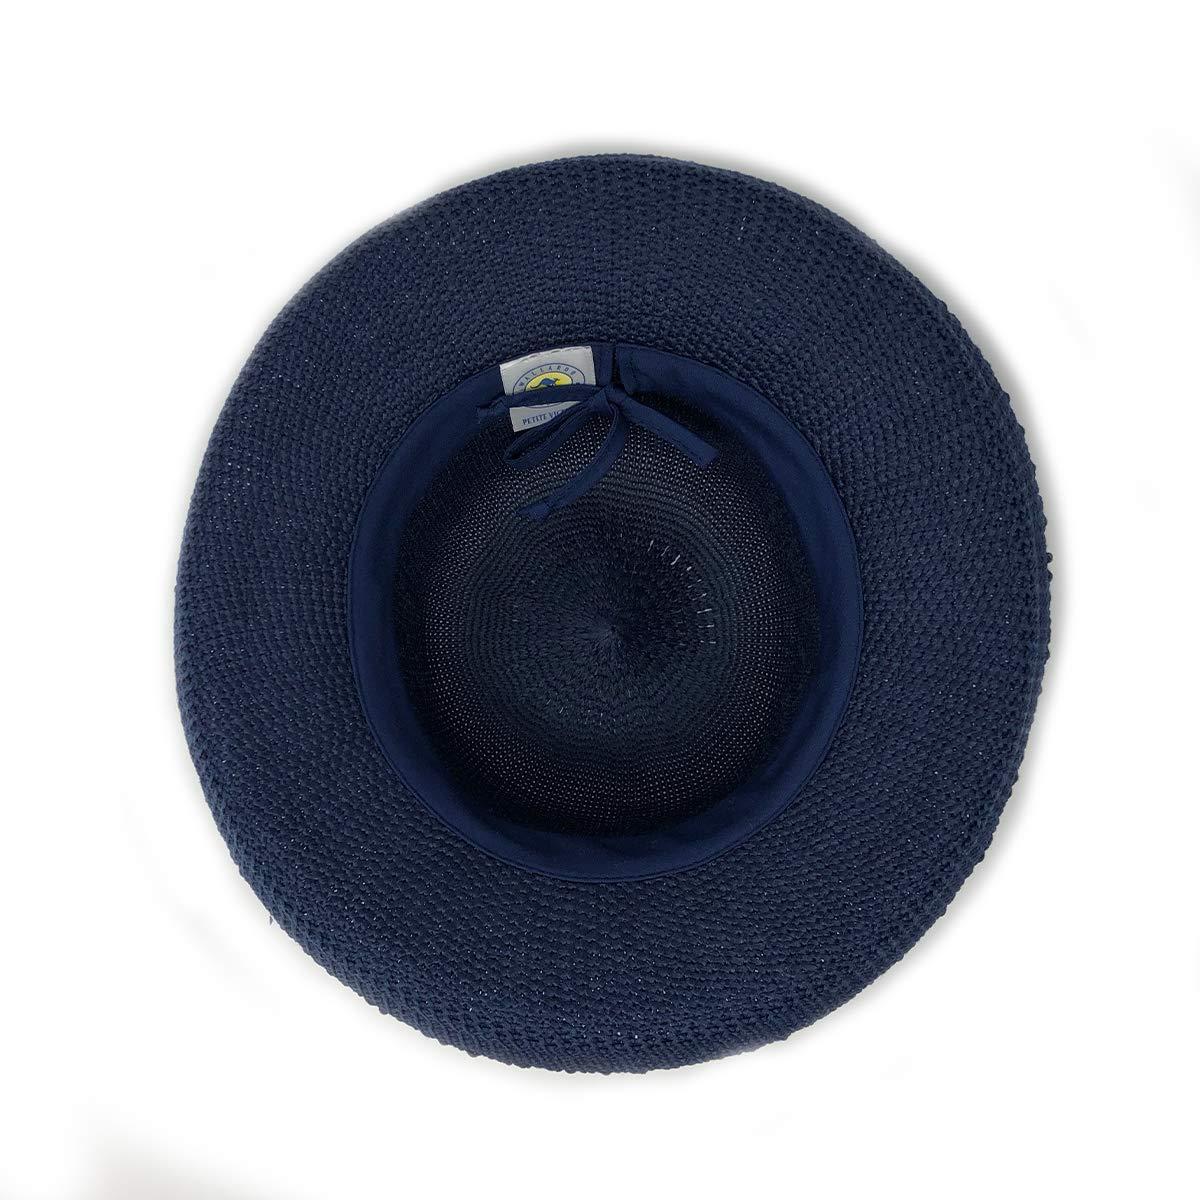 042c7e87169 Wallaroo Hat Company Womens Petite Victoria Sun Hat - Perfect for Smaller  Heads PVIC-15